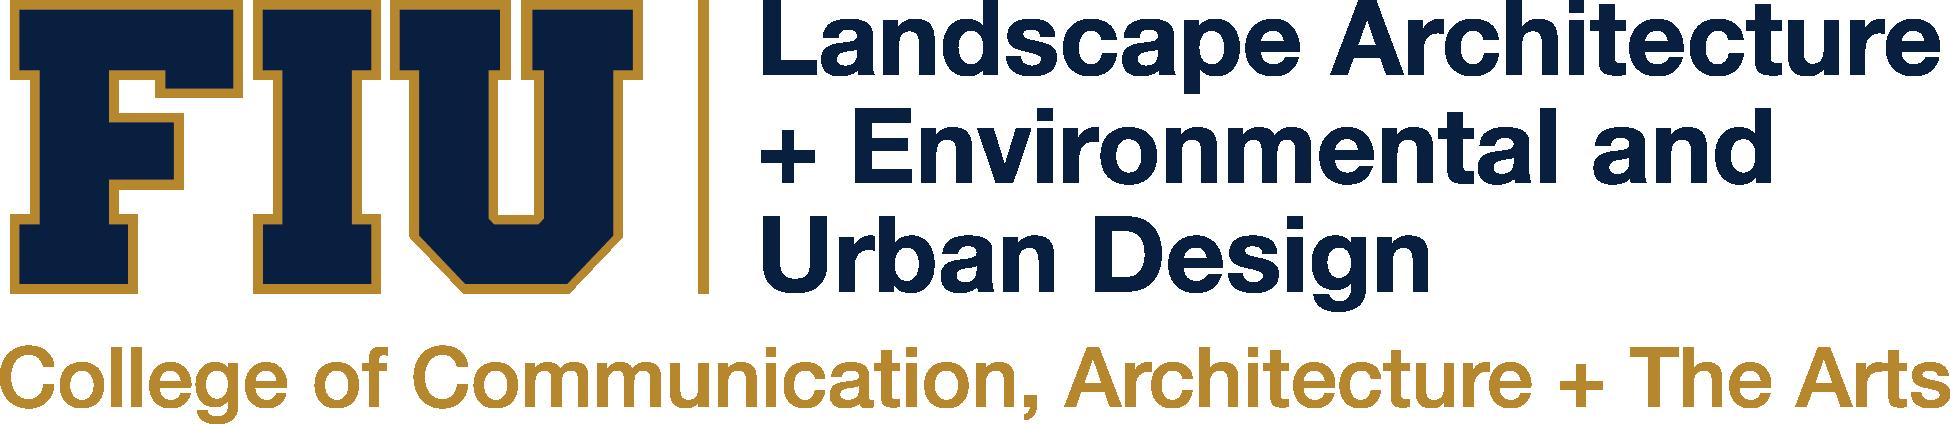 Department Of Landscape Architecture Department Of Landscape Architecture